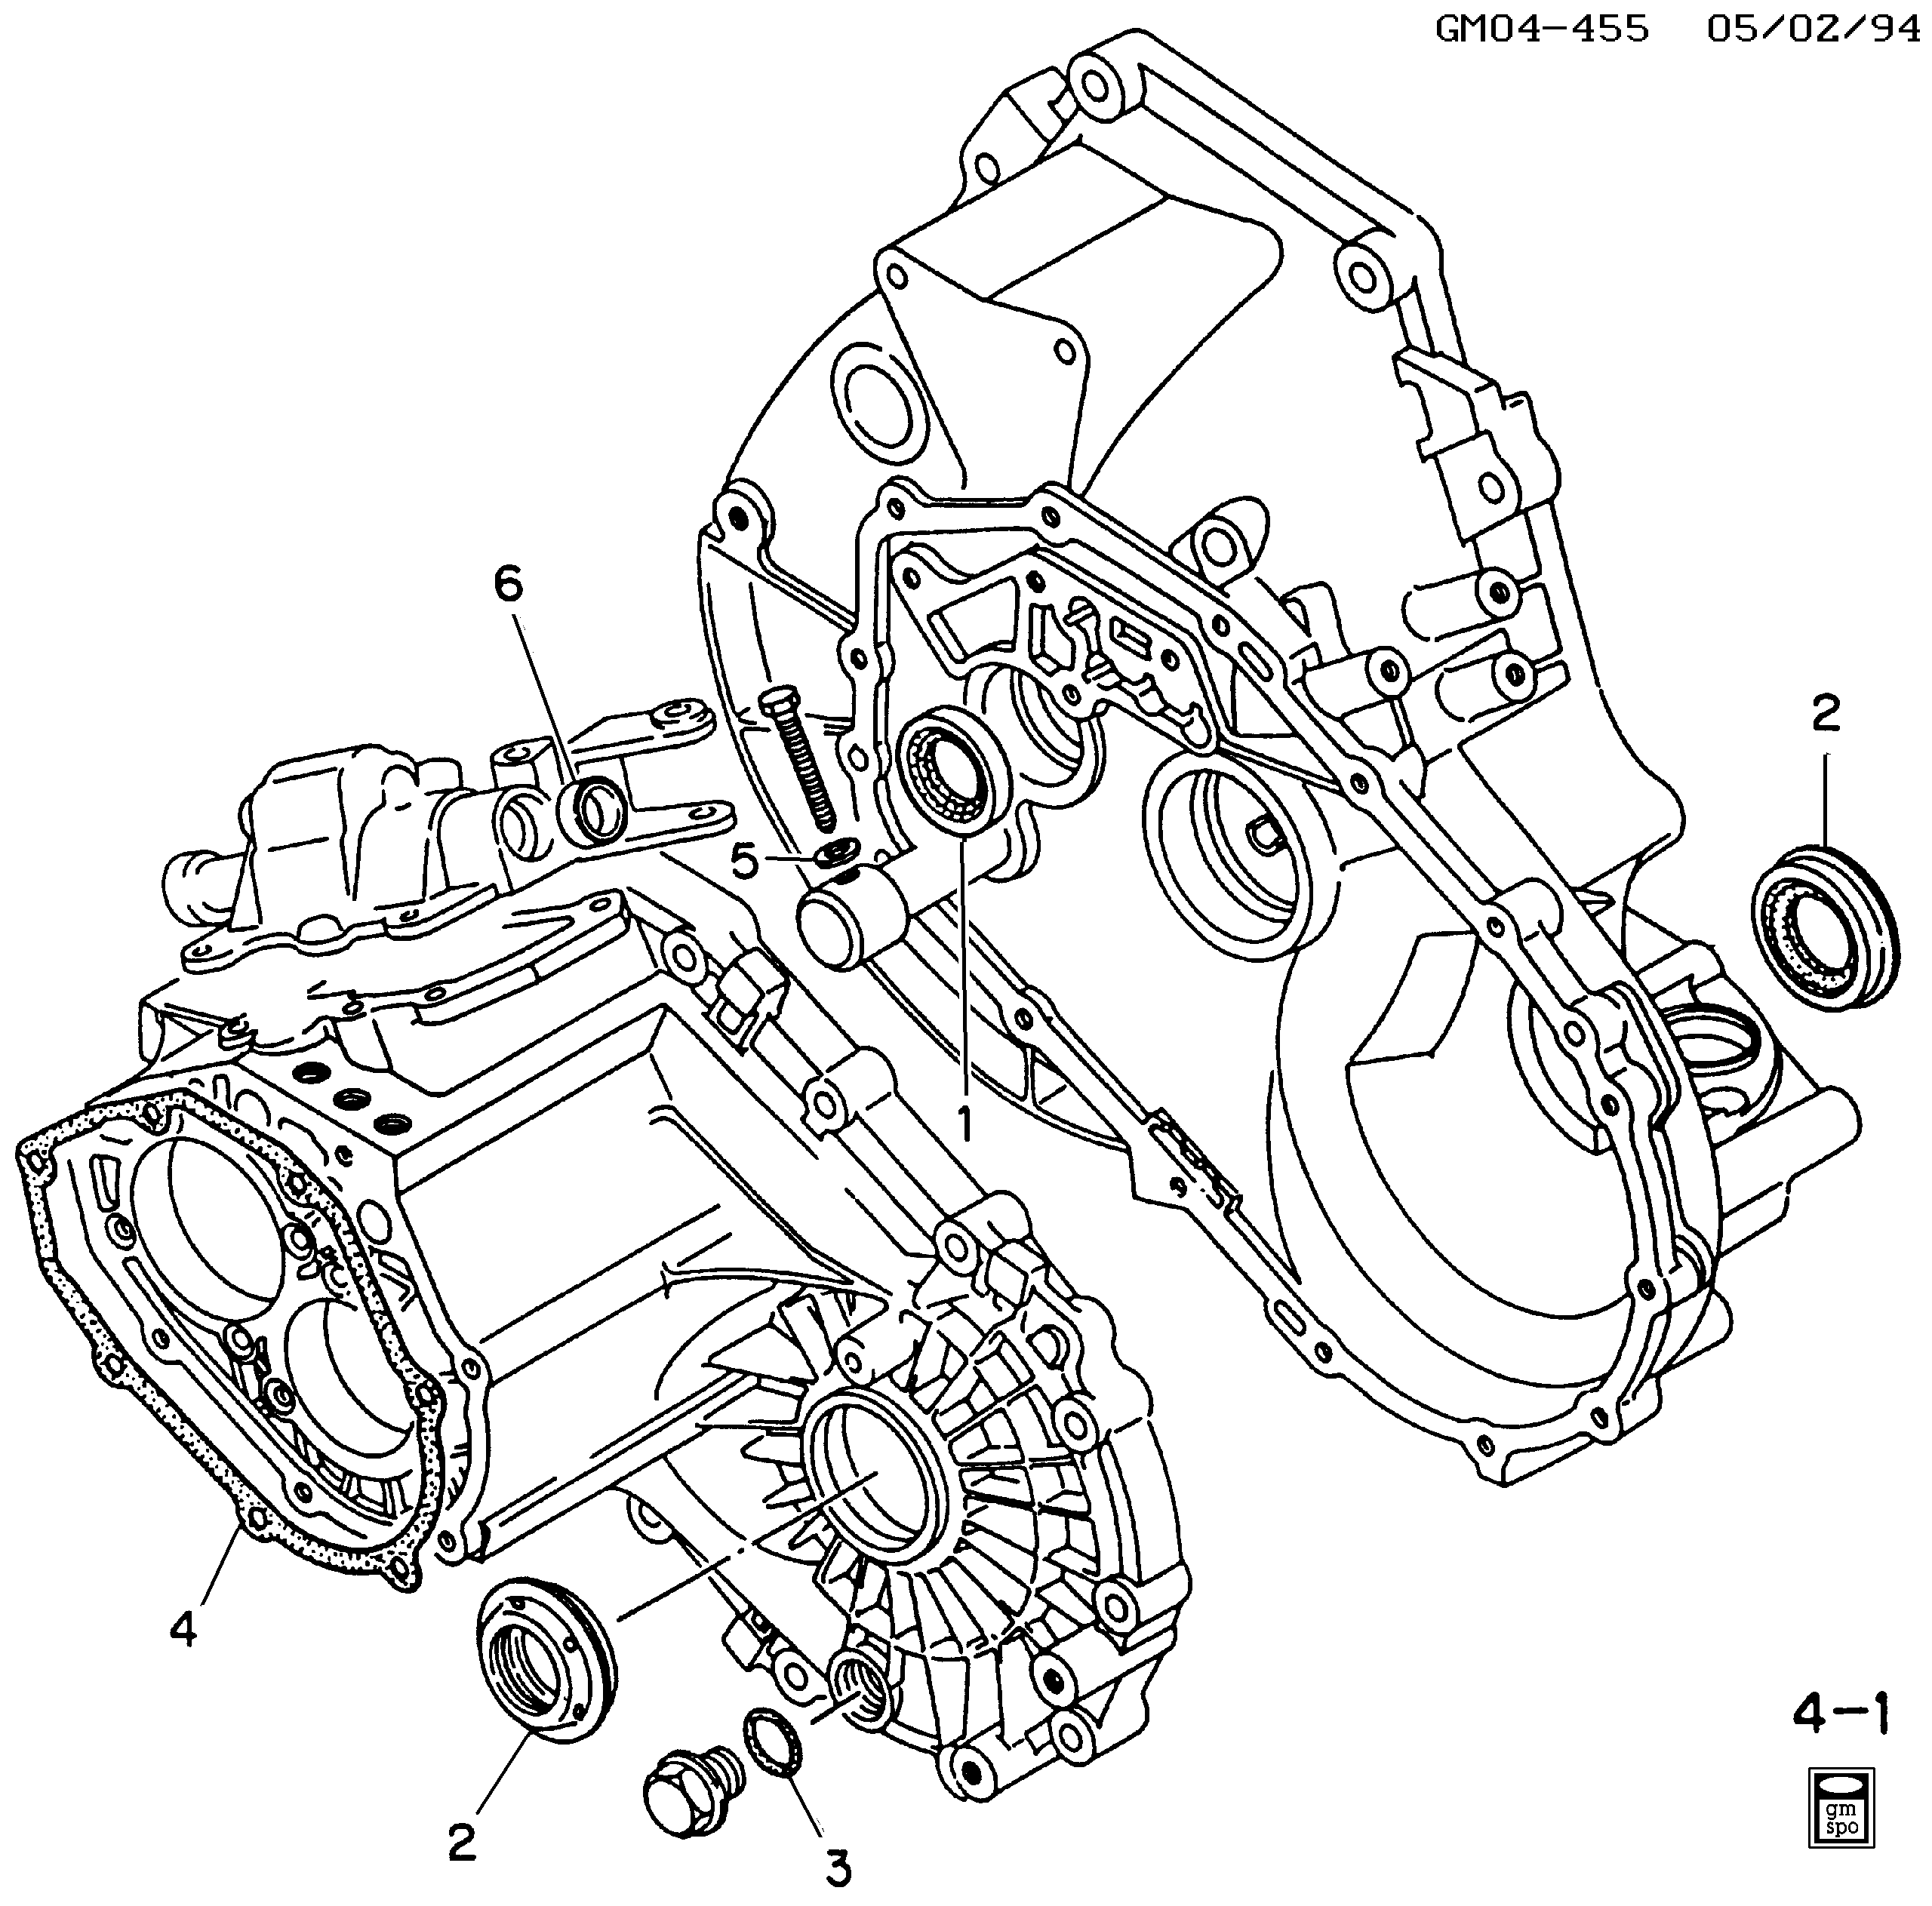 94 grand am engine diagram pontiac grand am n 5 speed manual transaxle part 4 internal  pontiac grand am n 5 speed manual